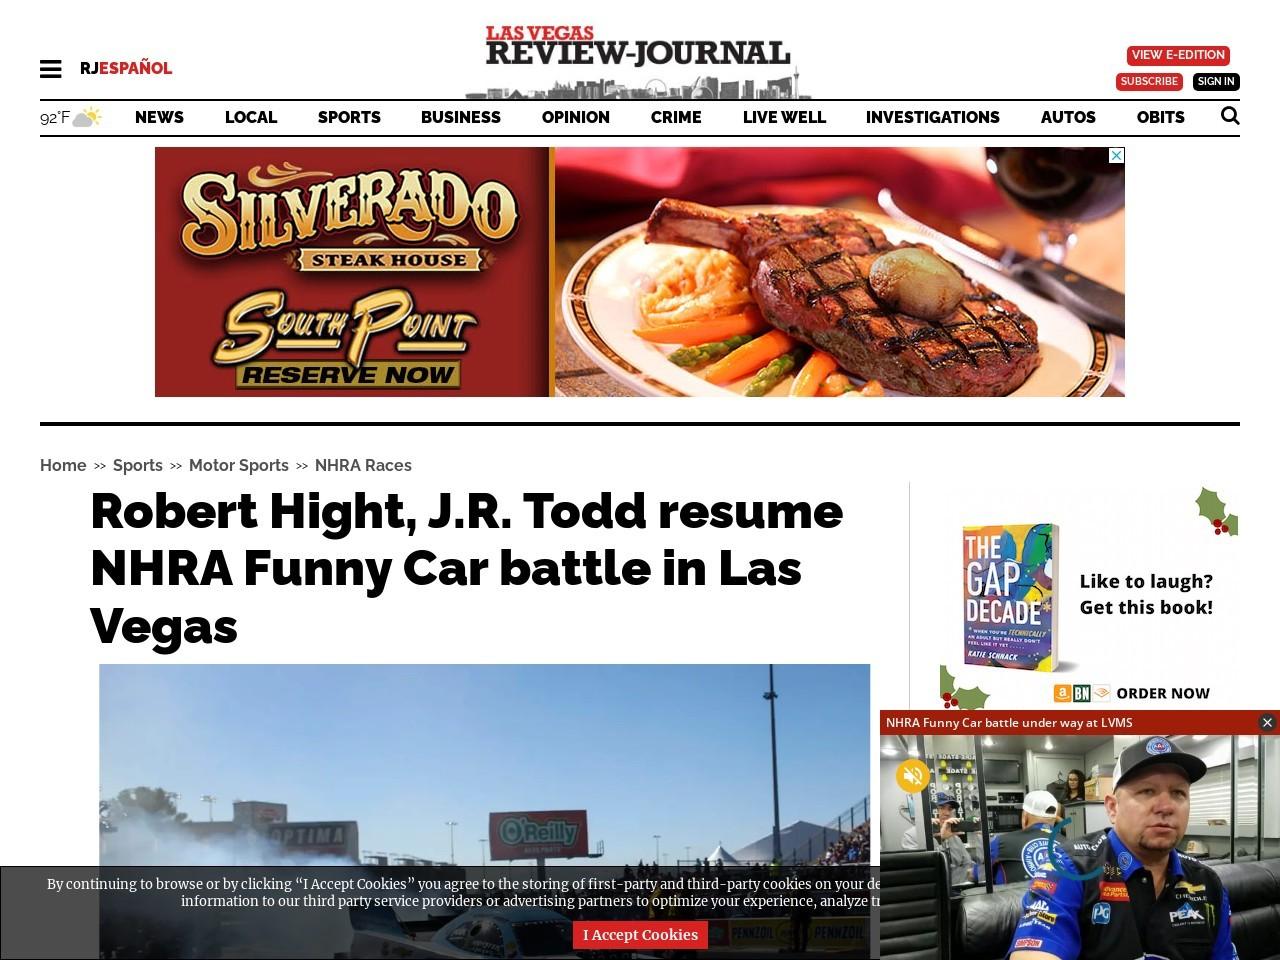 Robert Hight, J.R. Todd resume NHRA Funny Car battle in Las Vegas